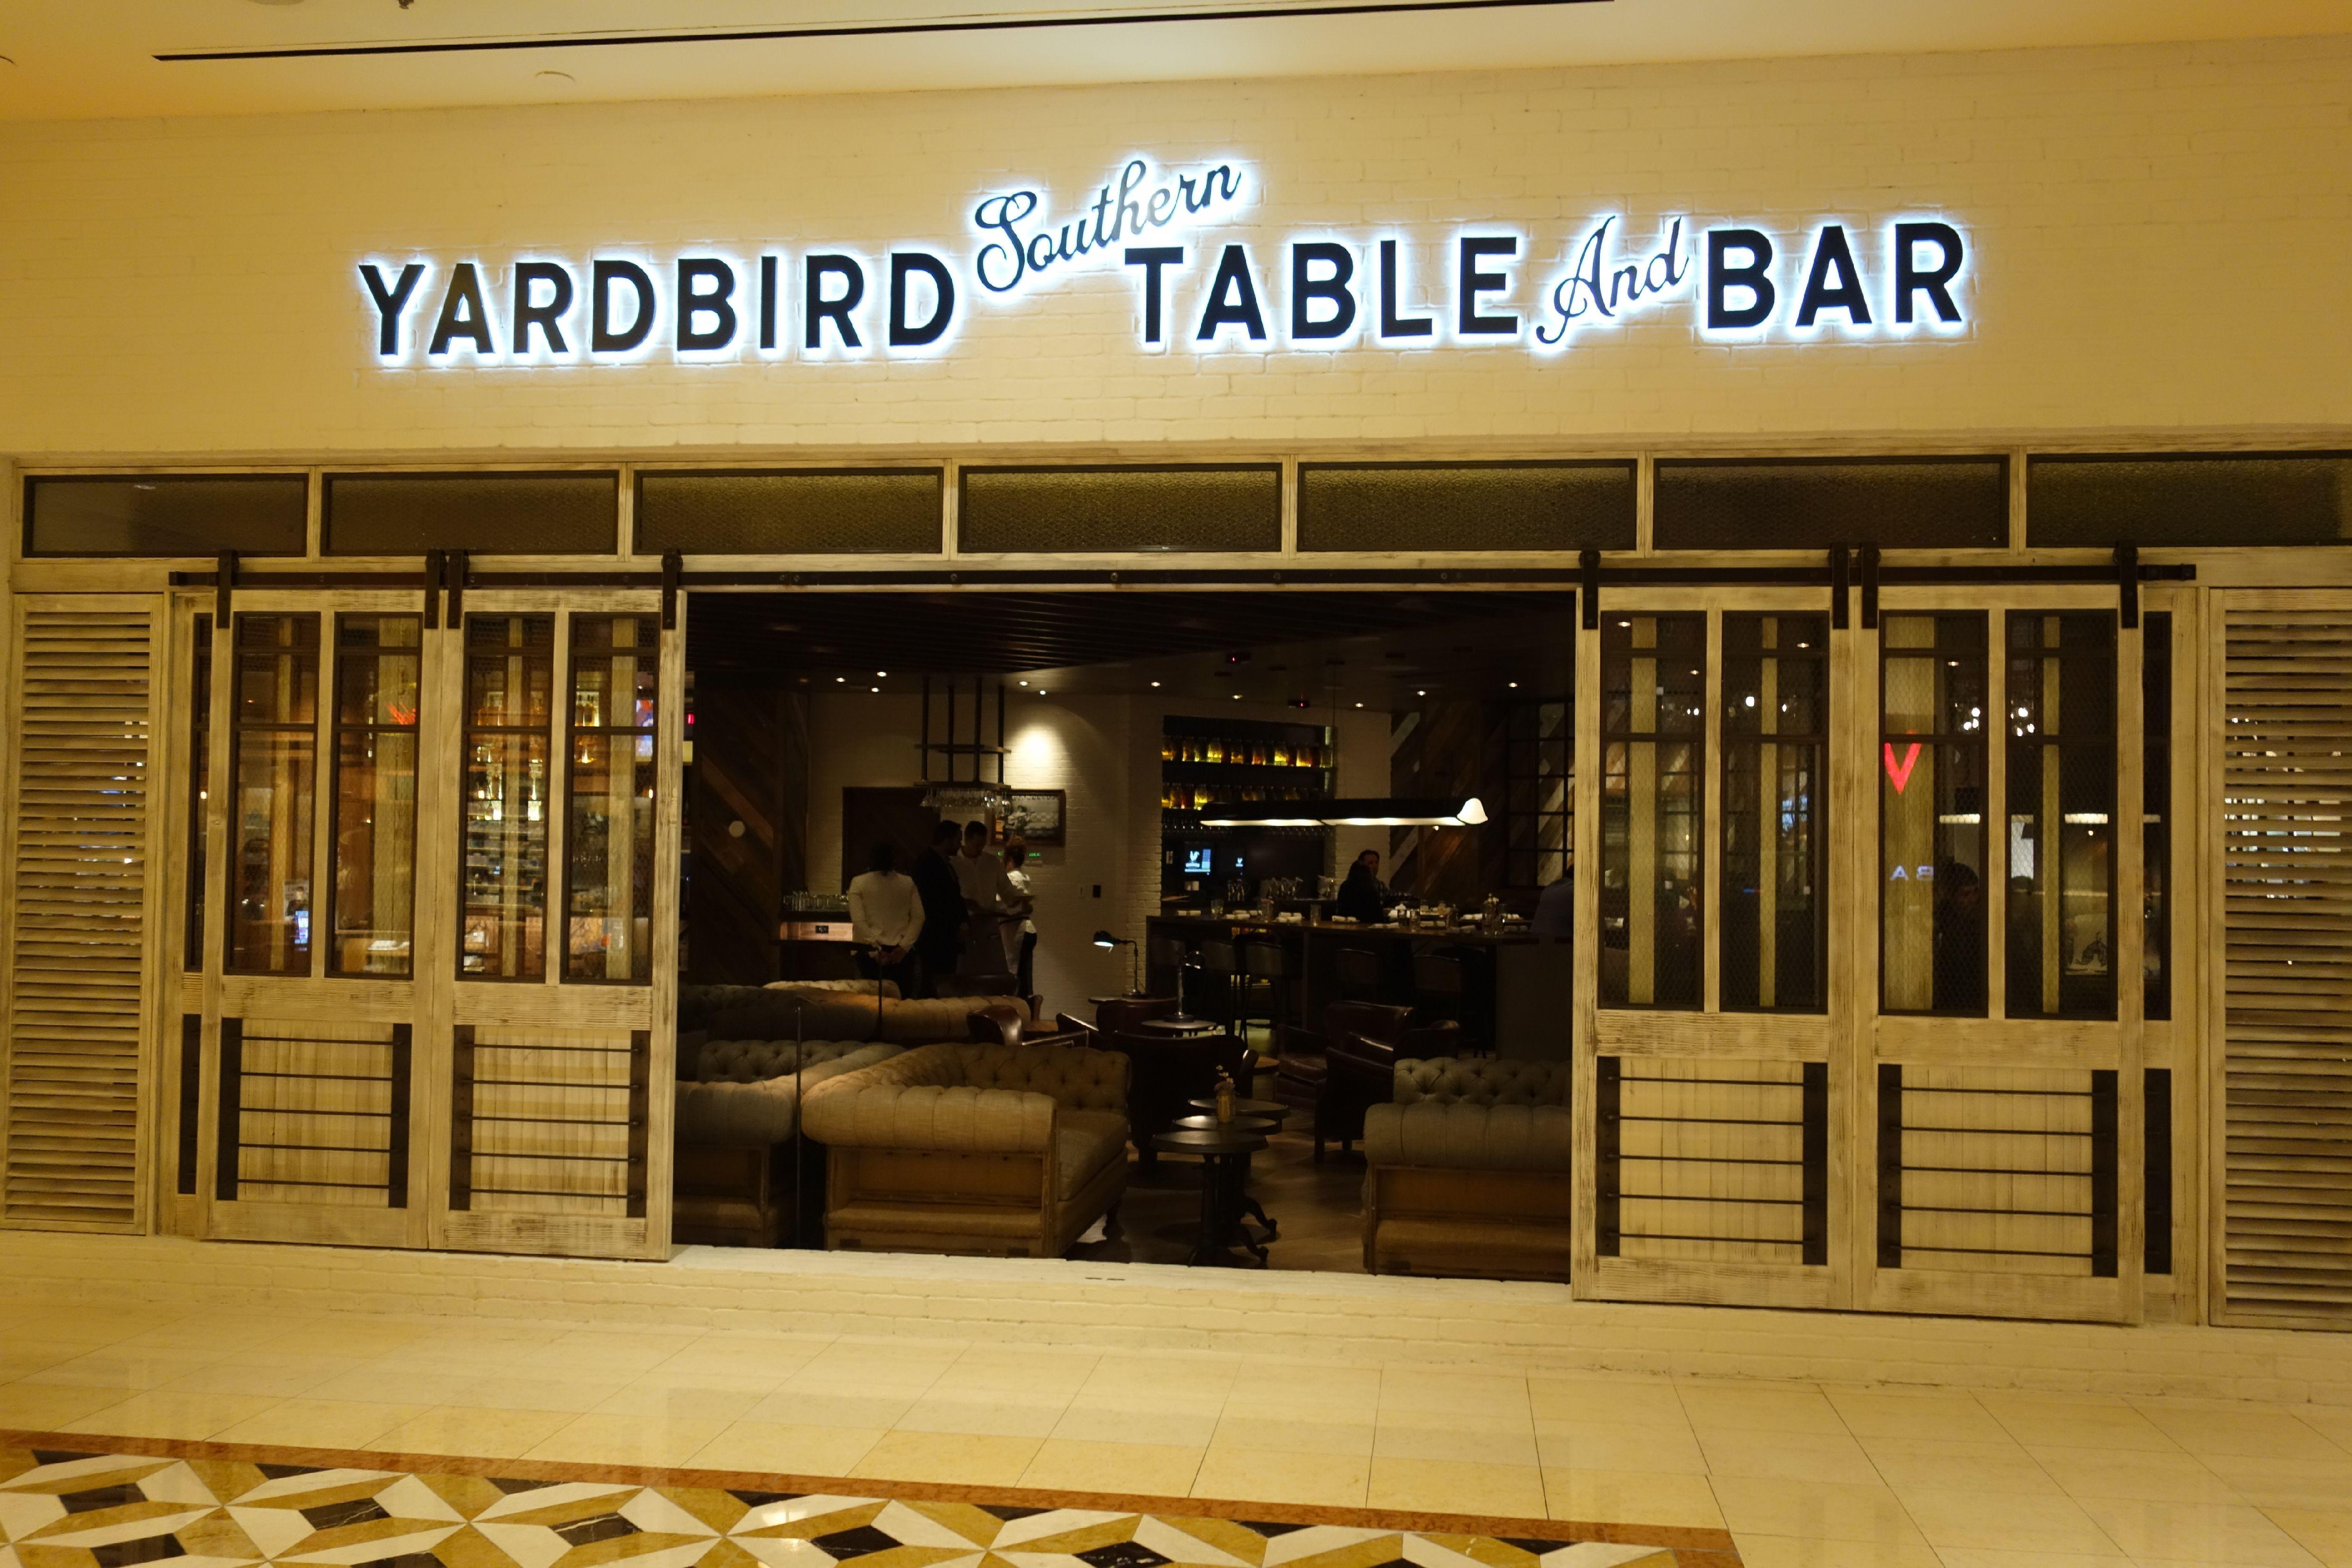 Yardbird exterior